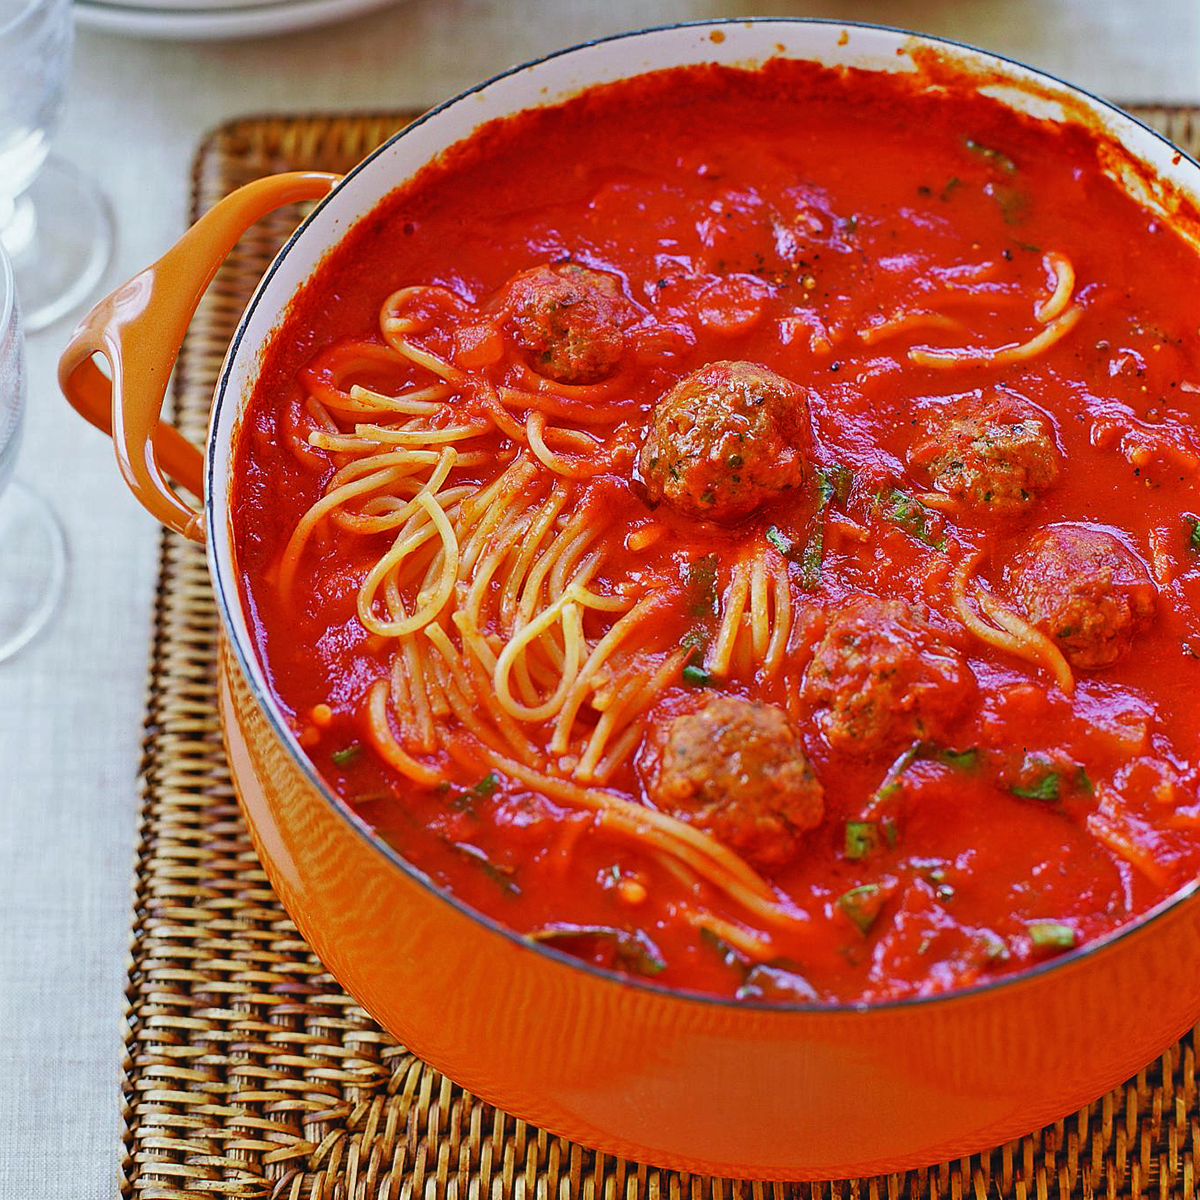 Mini Meatball and Broken Spaghetti Tomato Stoup